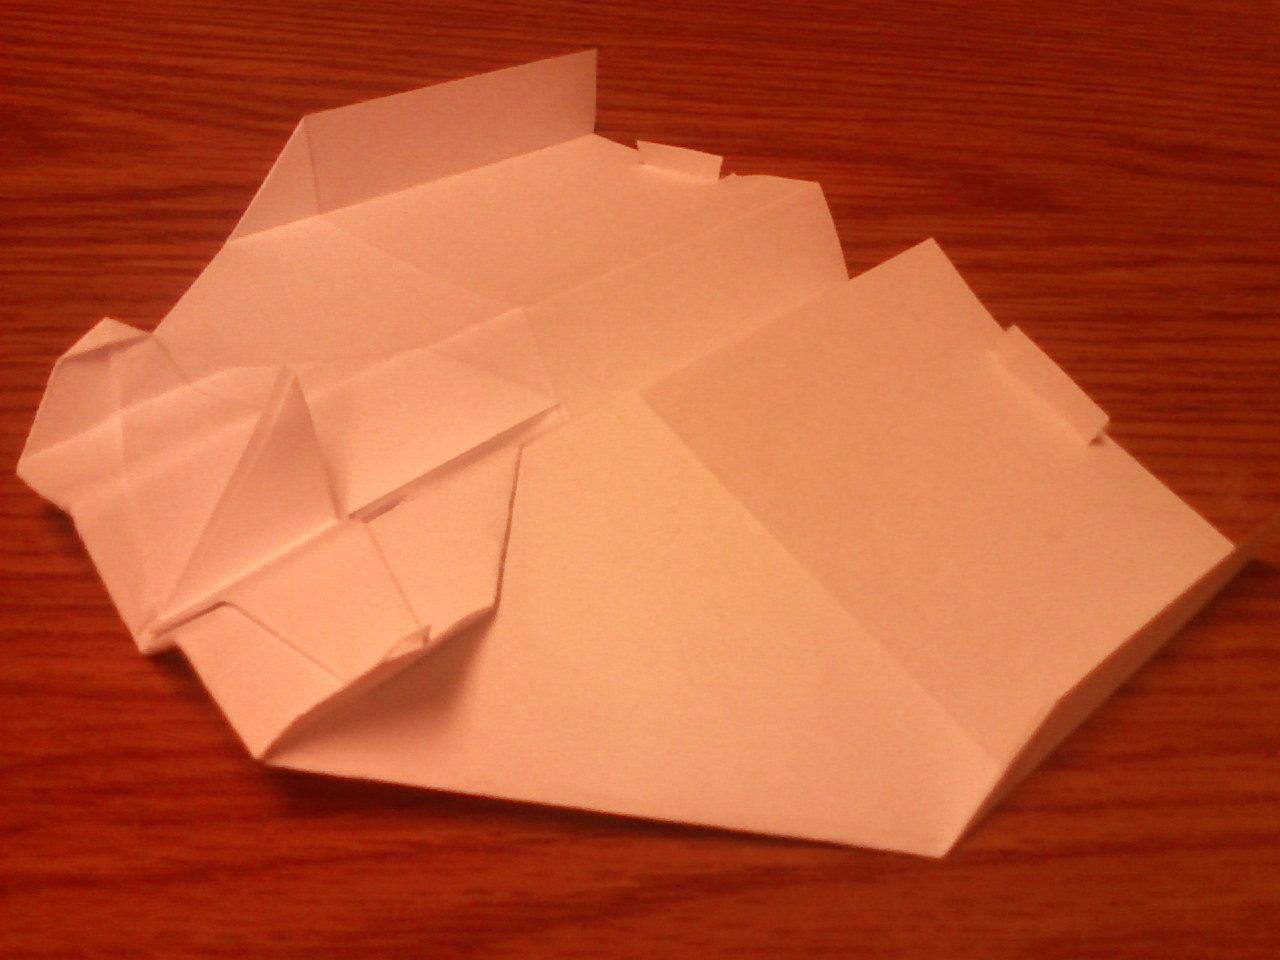 Hangtime! Paper airplane